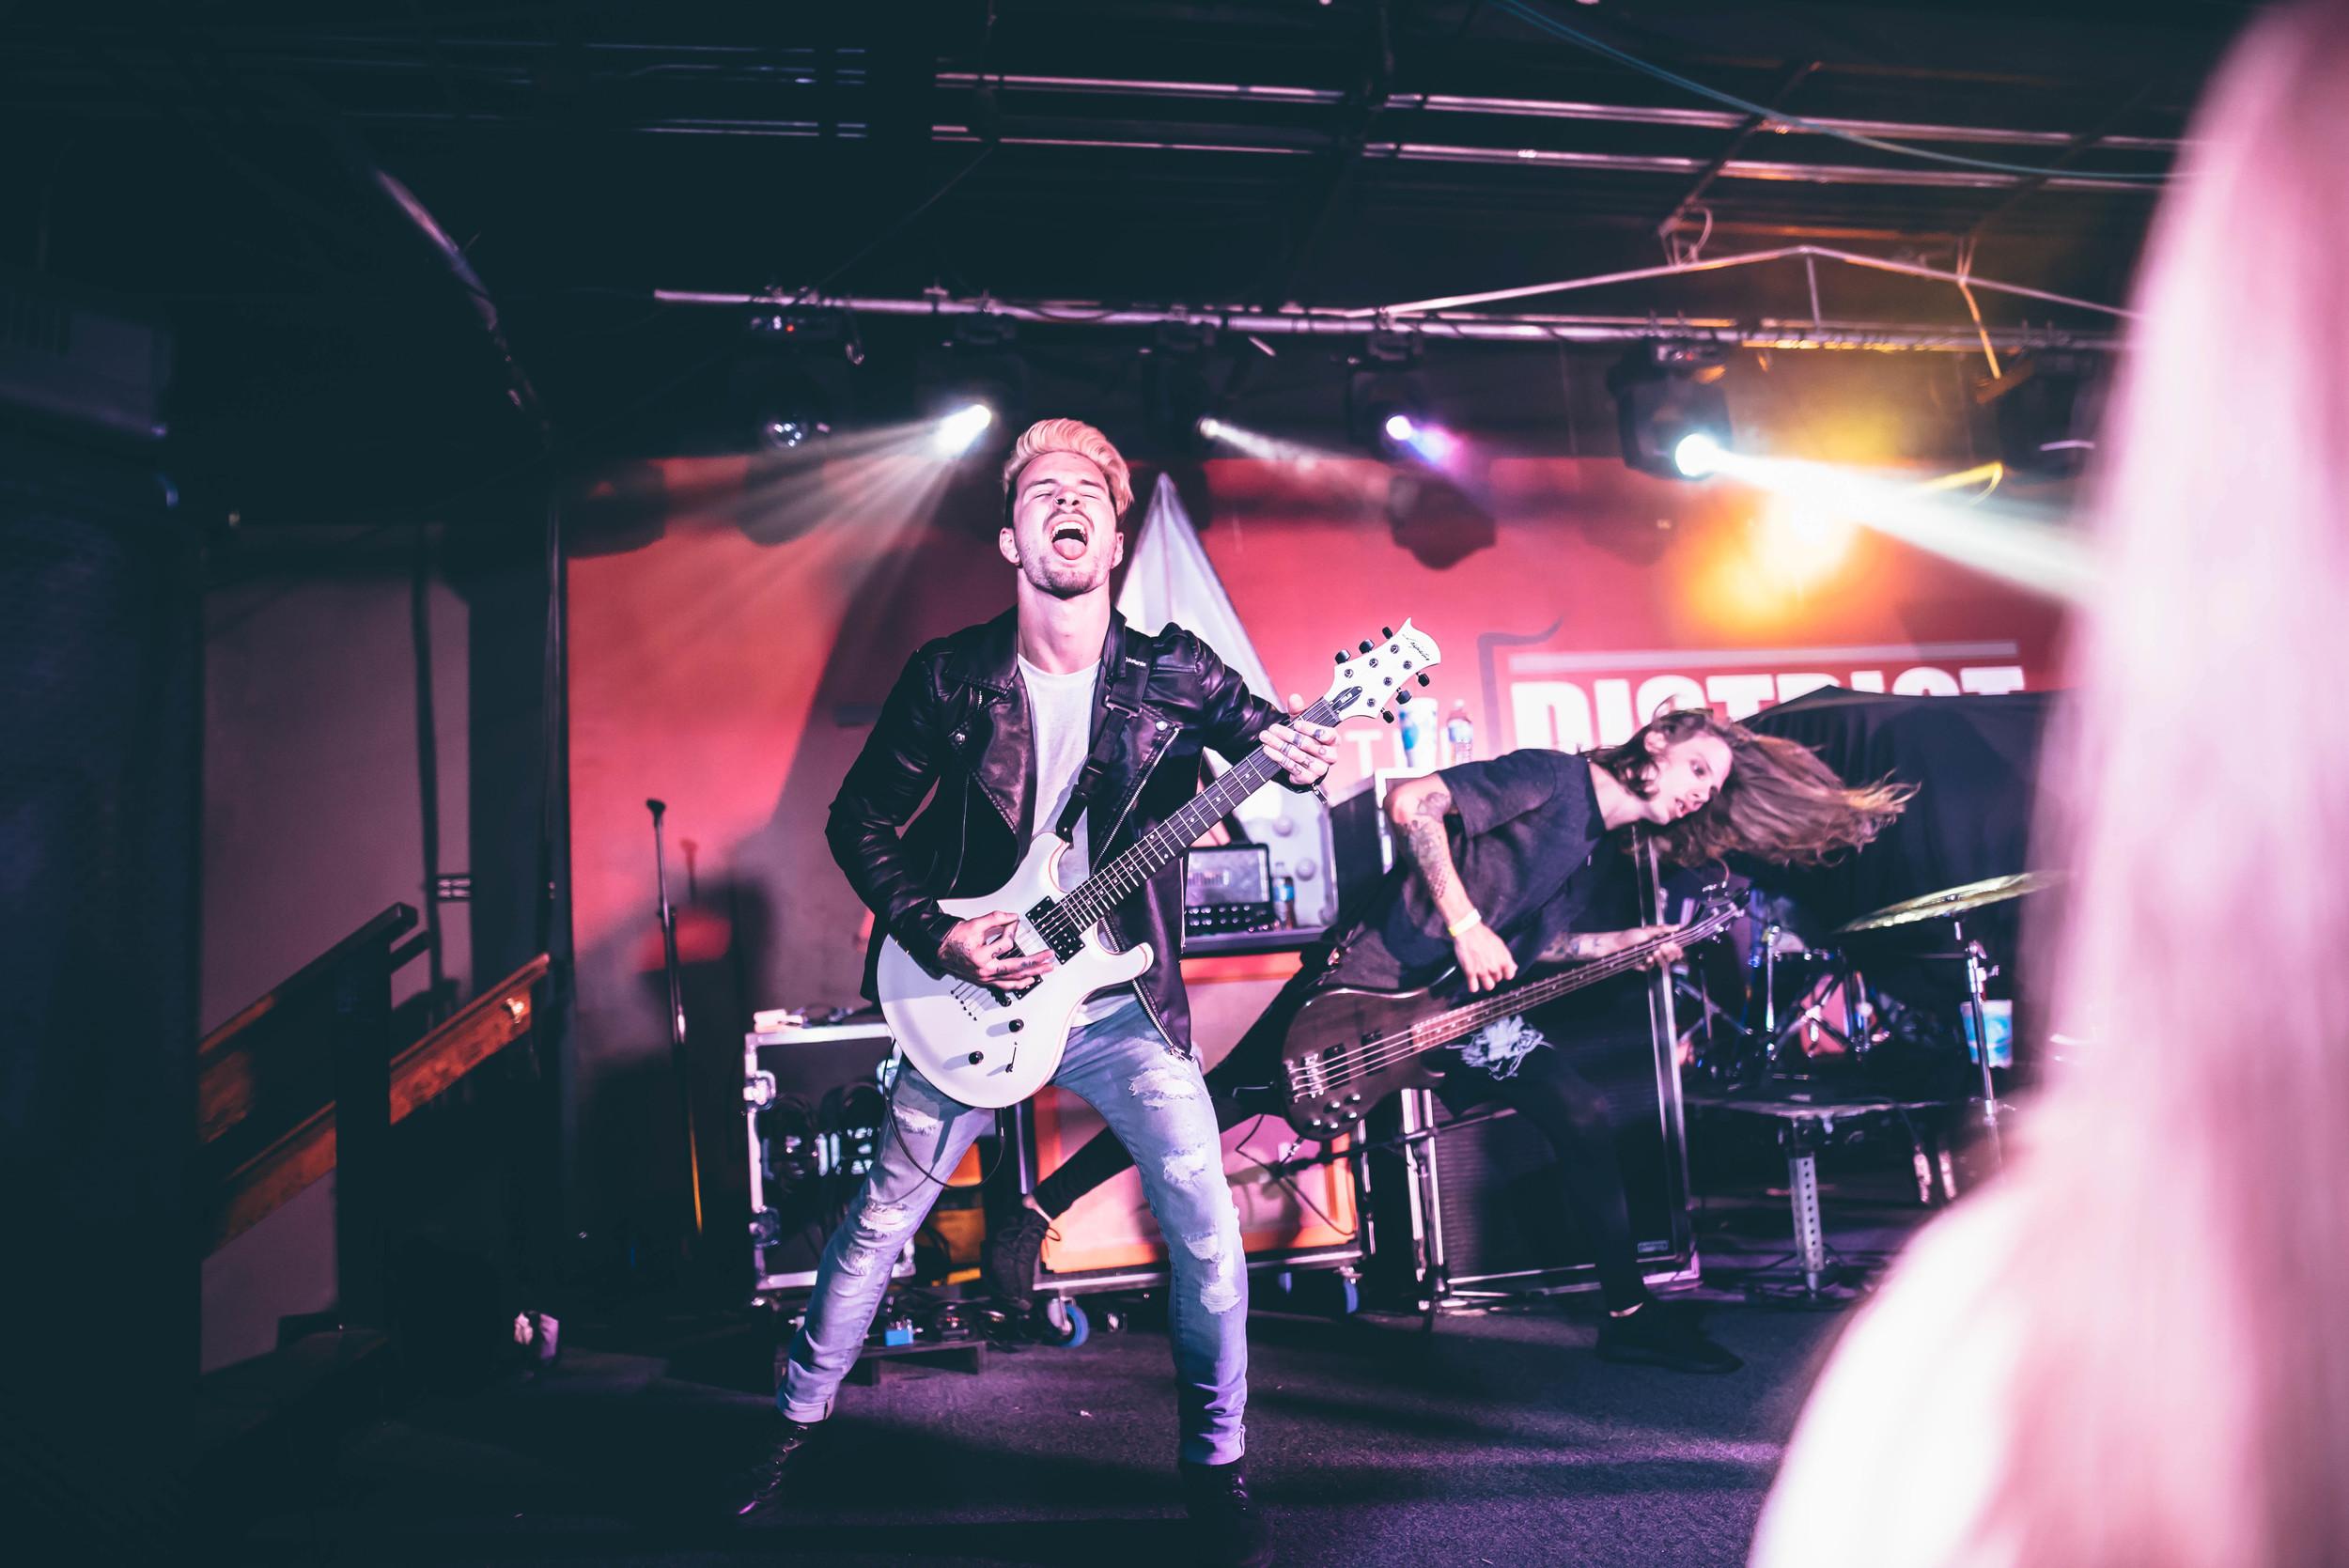 JH_musicphotography-3527.jpg